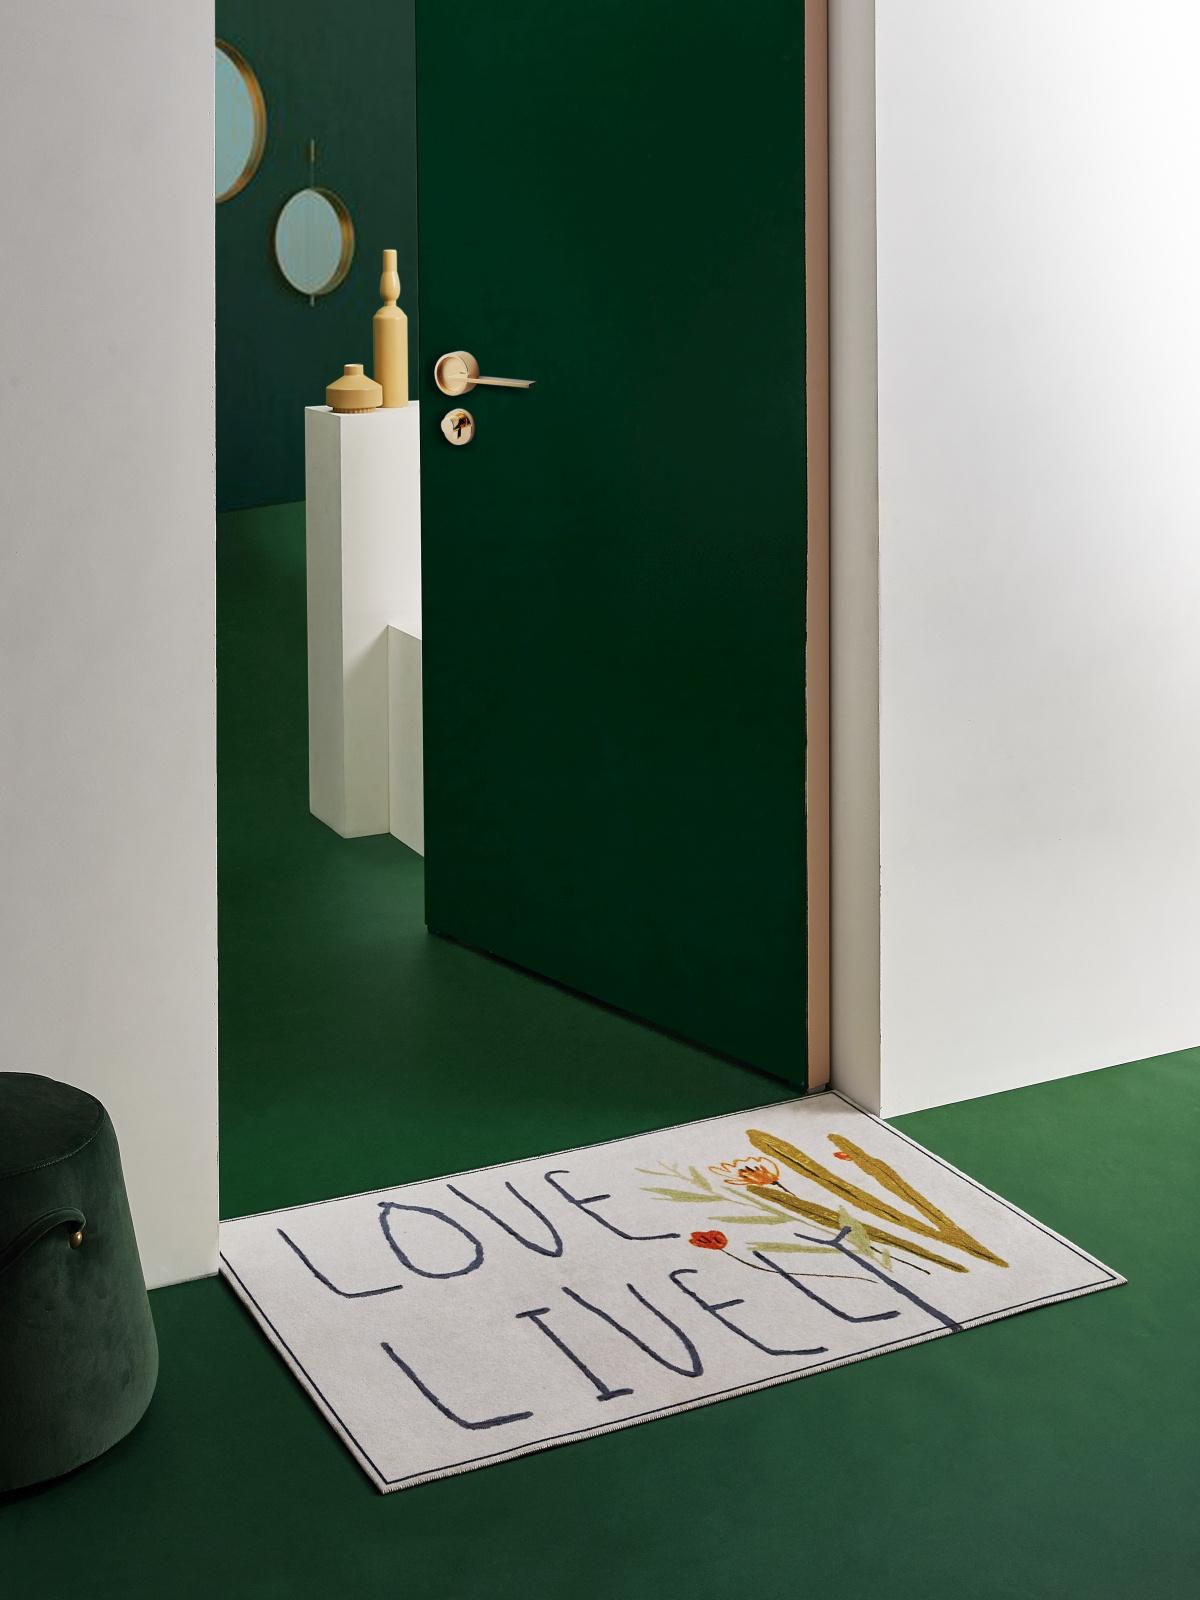 ��i*y��ZI�c_门垫艺术空间拍摄|摄影|产品|changleiy - 原创作品